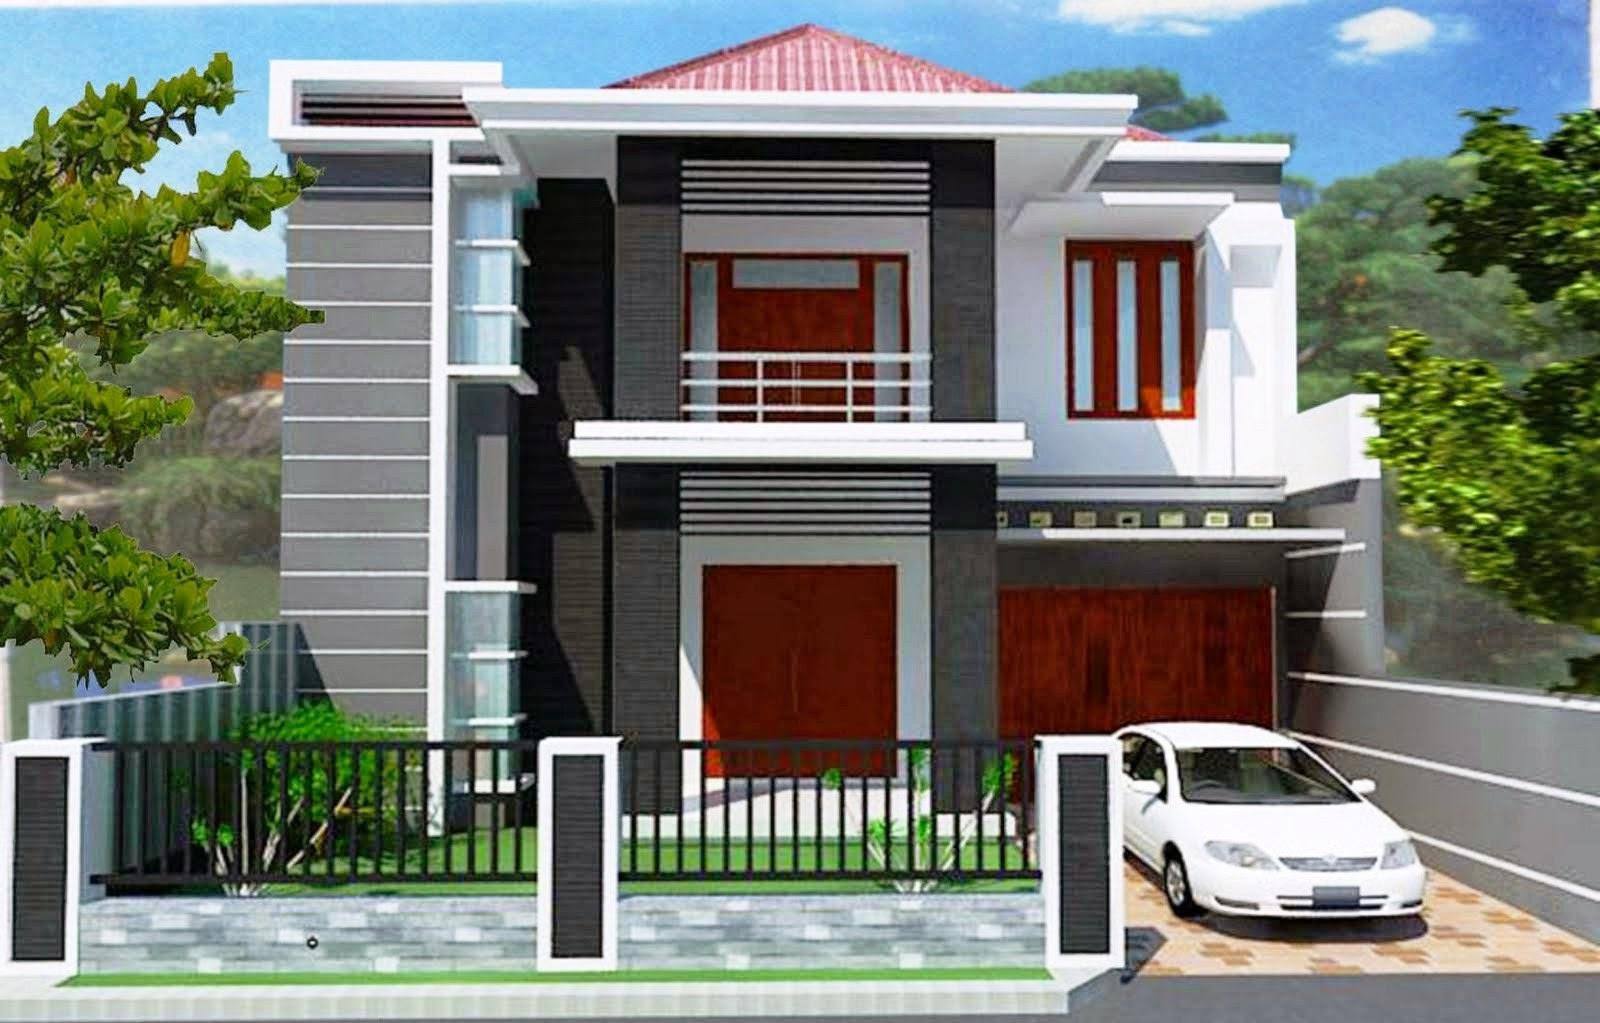 Contoh Desain Rumah Minimalis Modern Kumpulan Model Rumah Minimalis